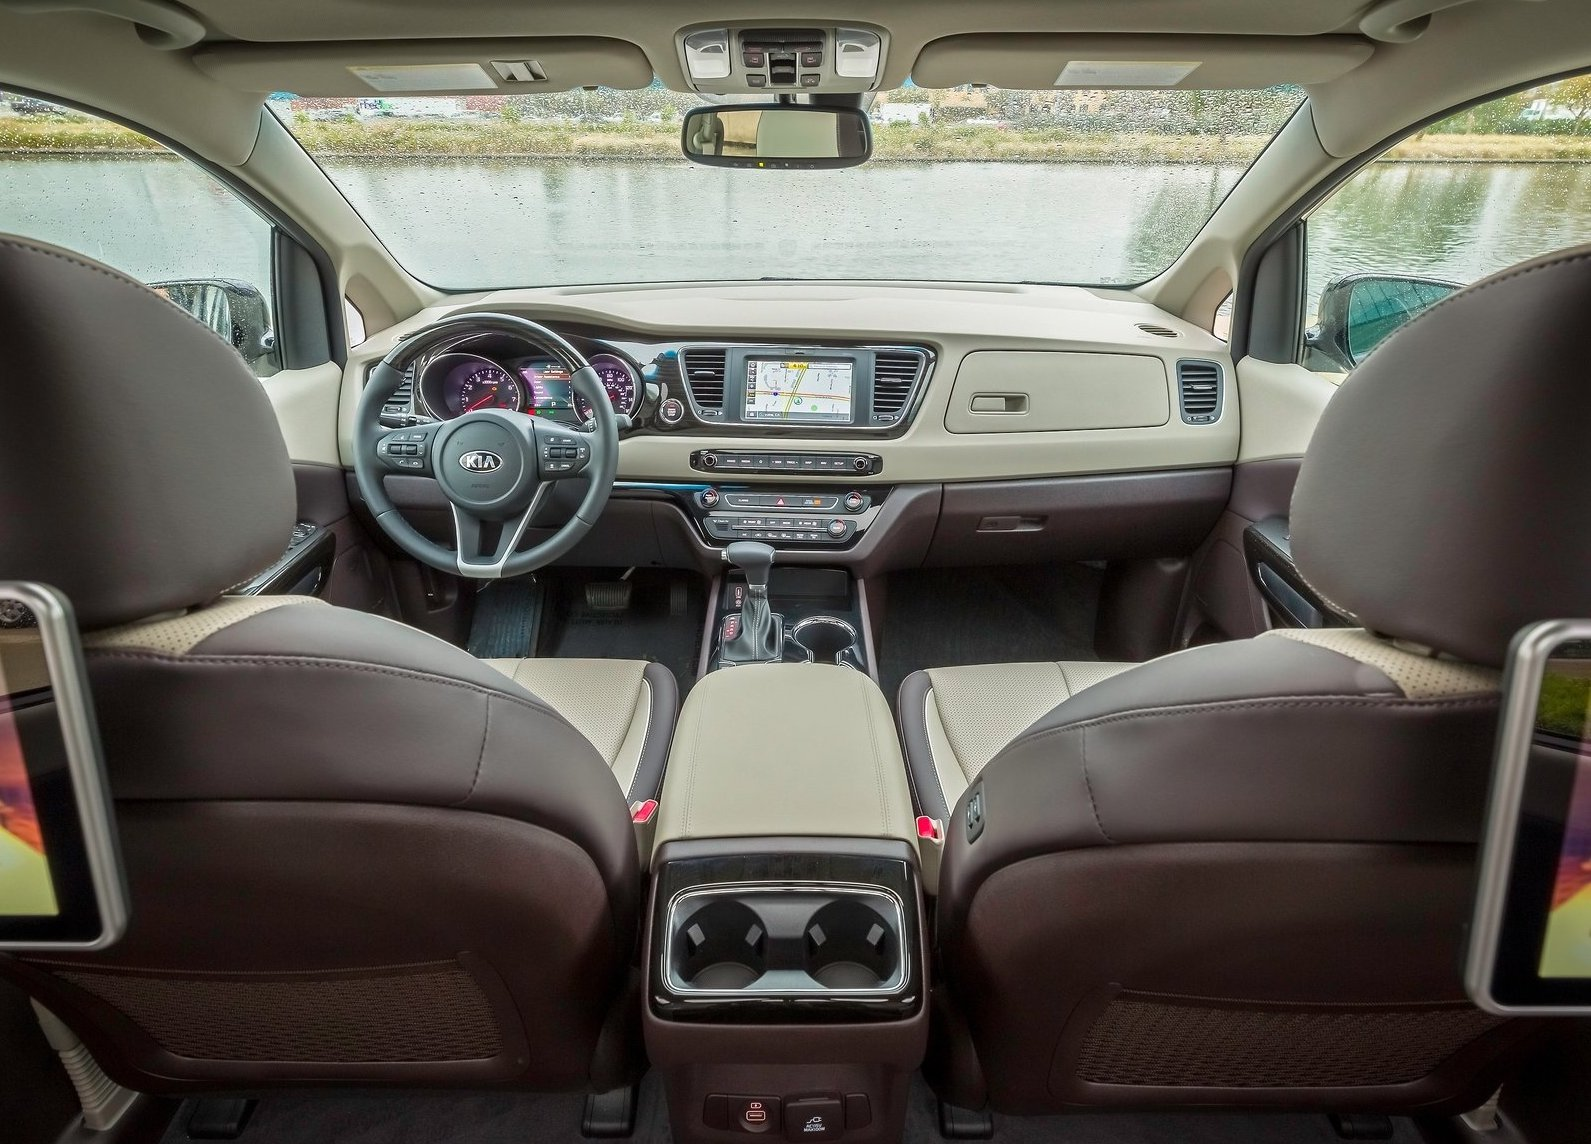 Minivan For Sale >> 2019 Kia Carnival facelift revealed, V6 gets 8-speed auto ...